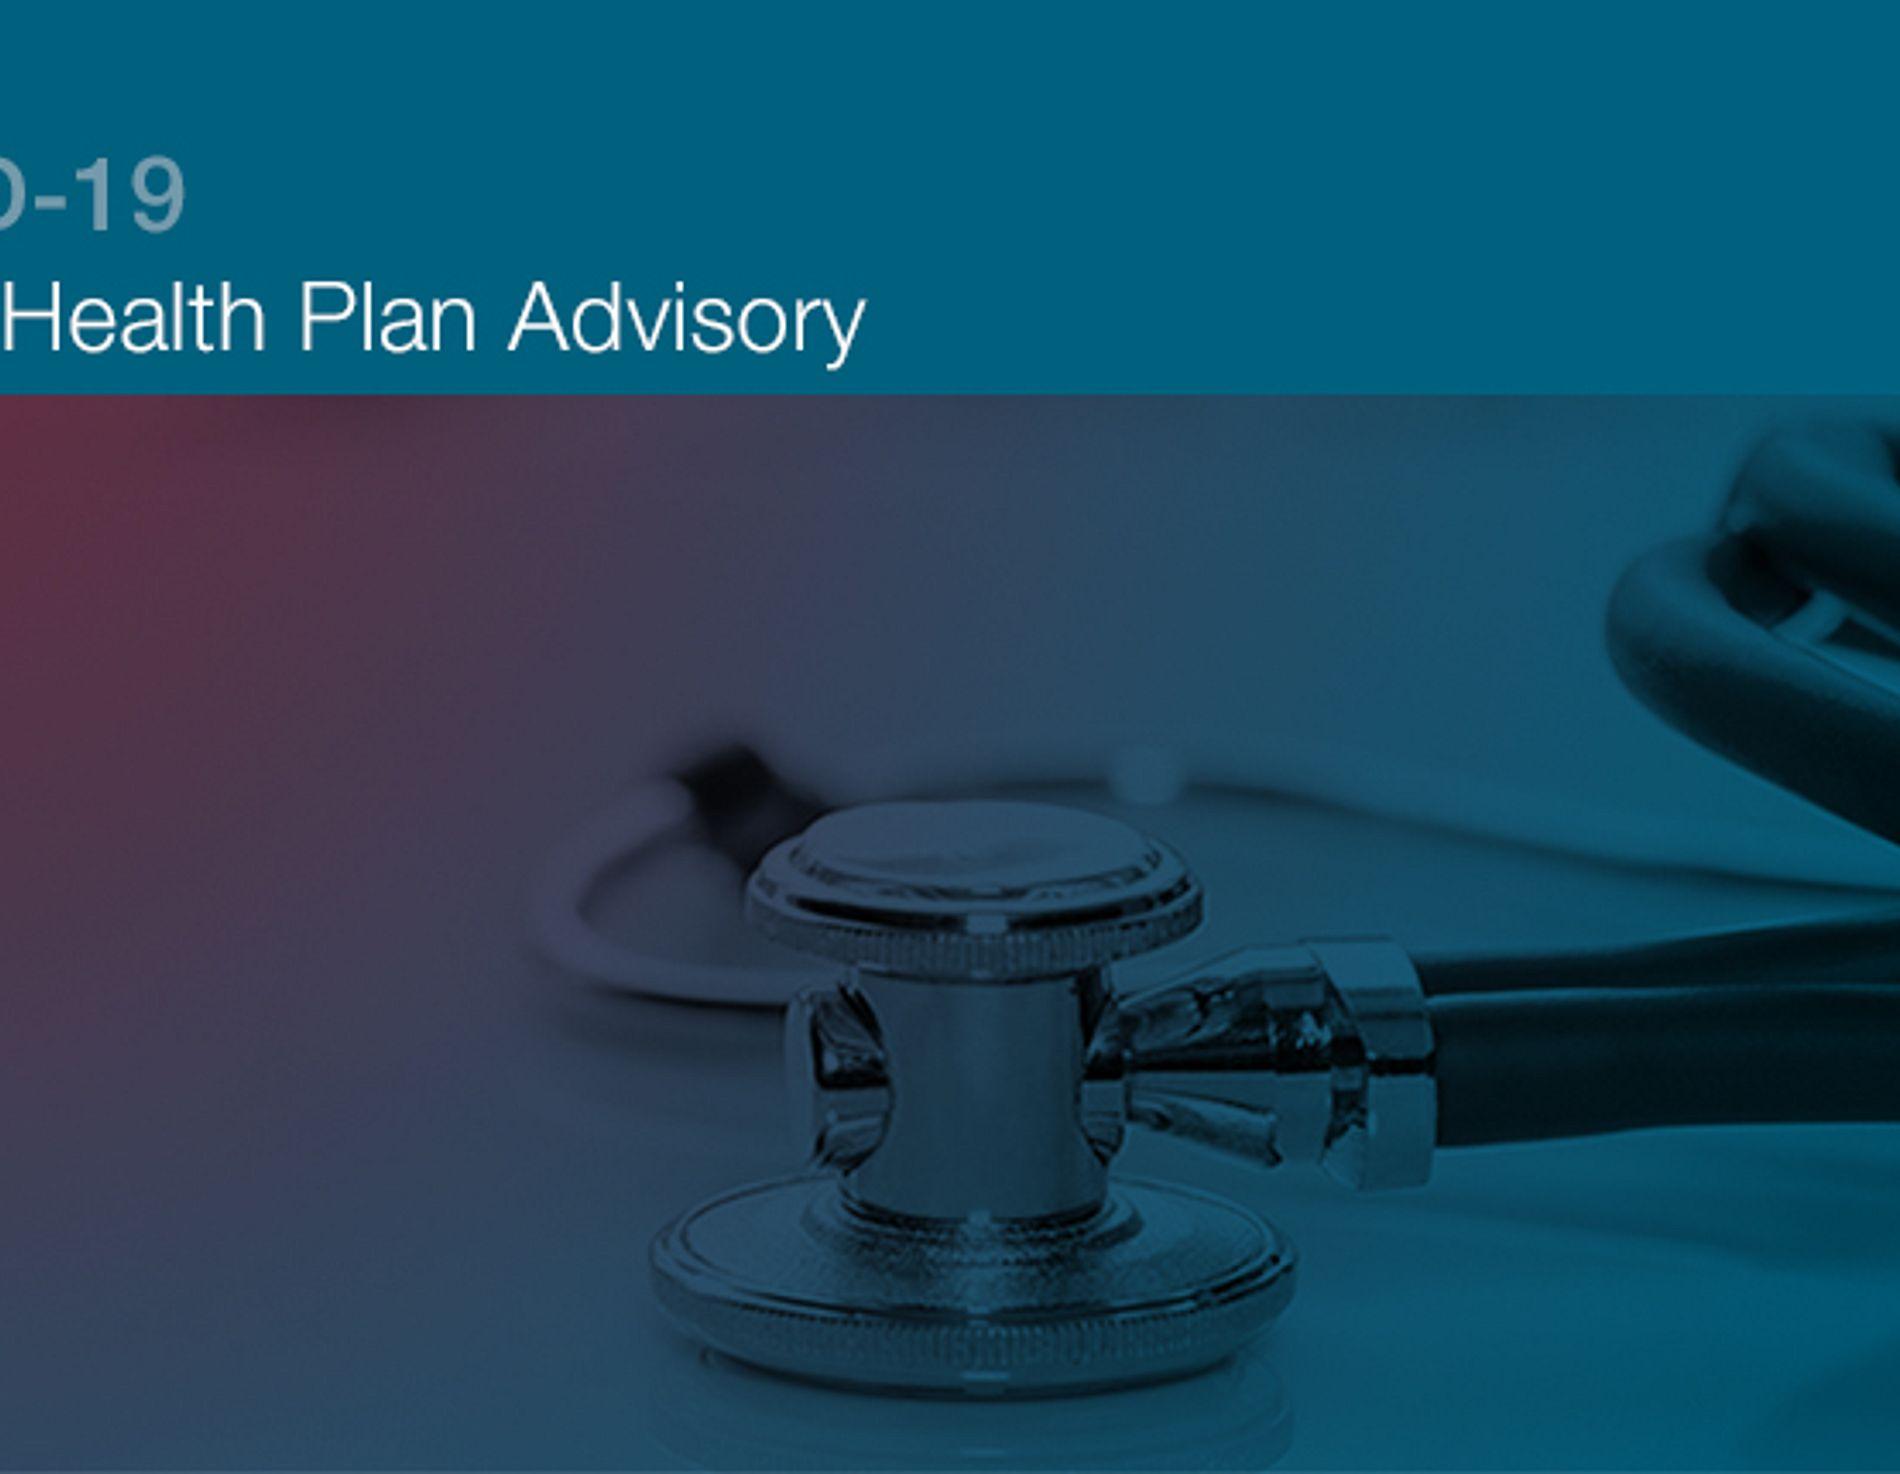 Group health plan advisory